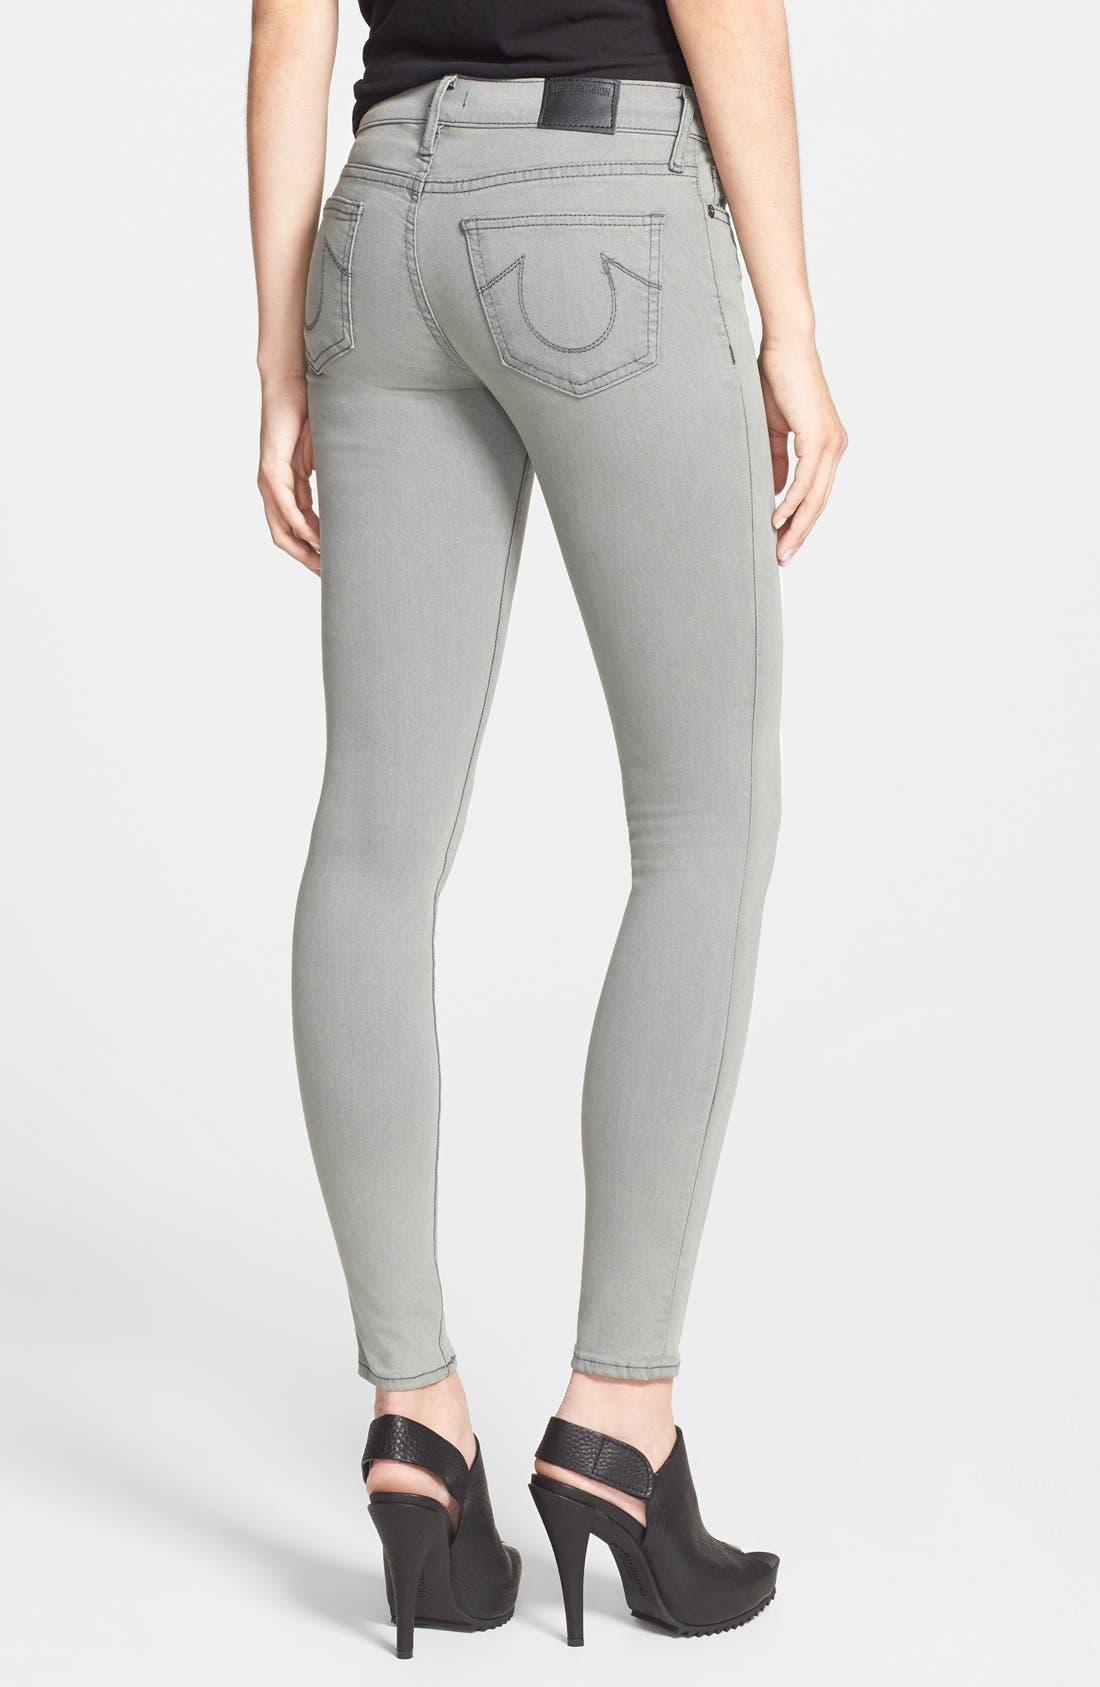 Alternate Image 2  - True Religion Brand Jeans 'Halle' Skinny Jeans (Protester's Song)